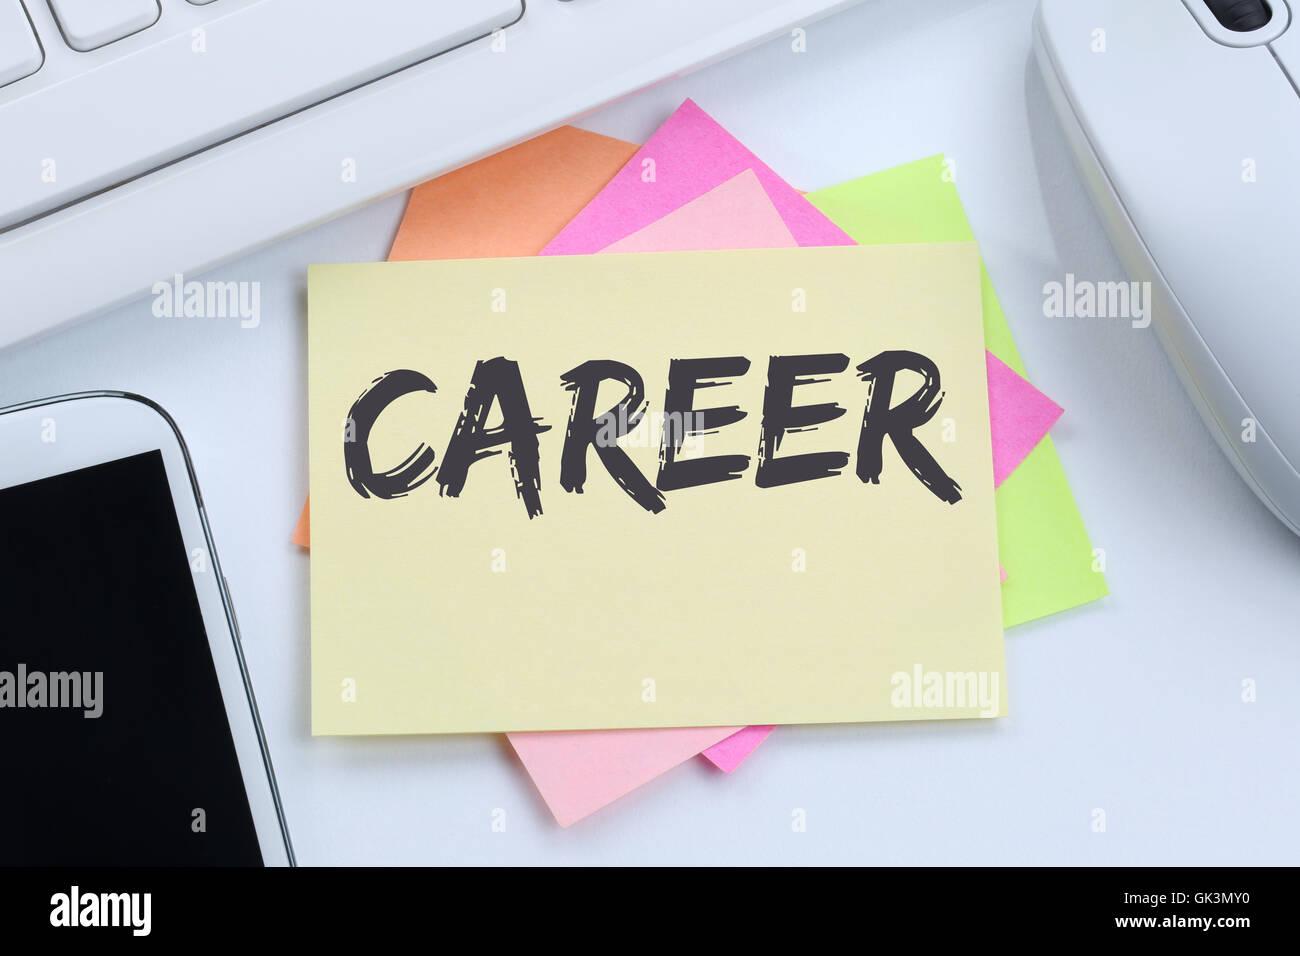 Career opportunities goals success and development business concept desk computer keyboard Stock Photo